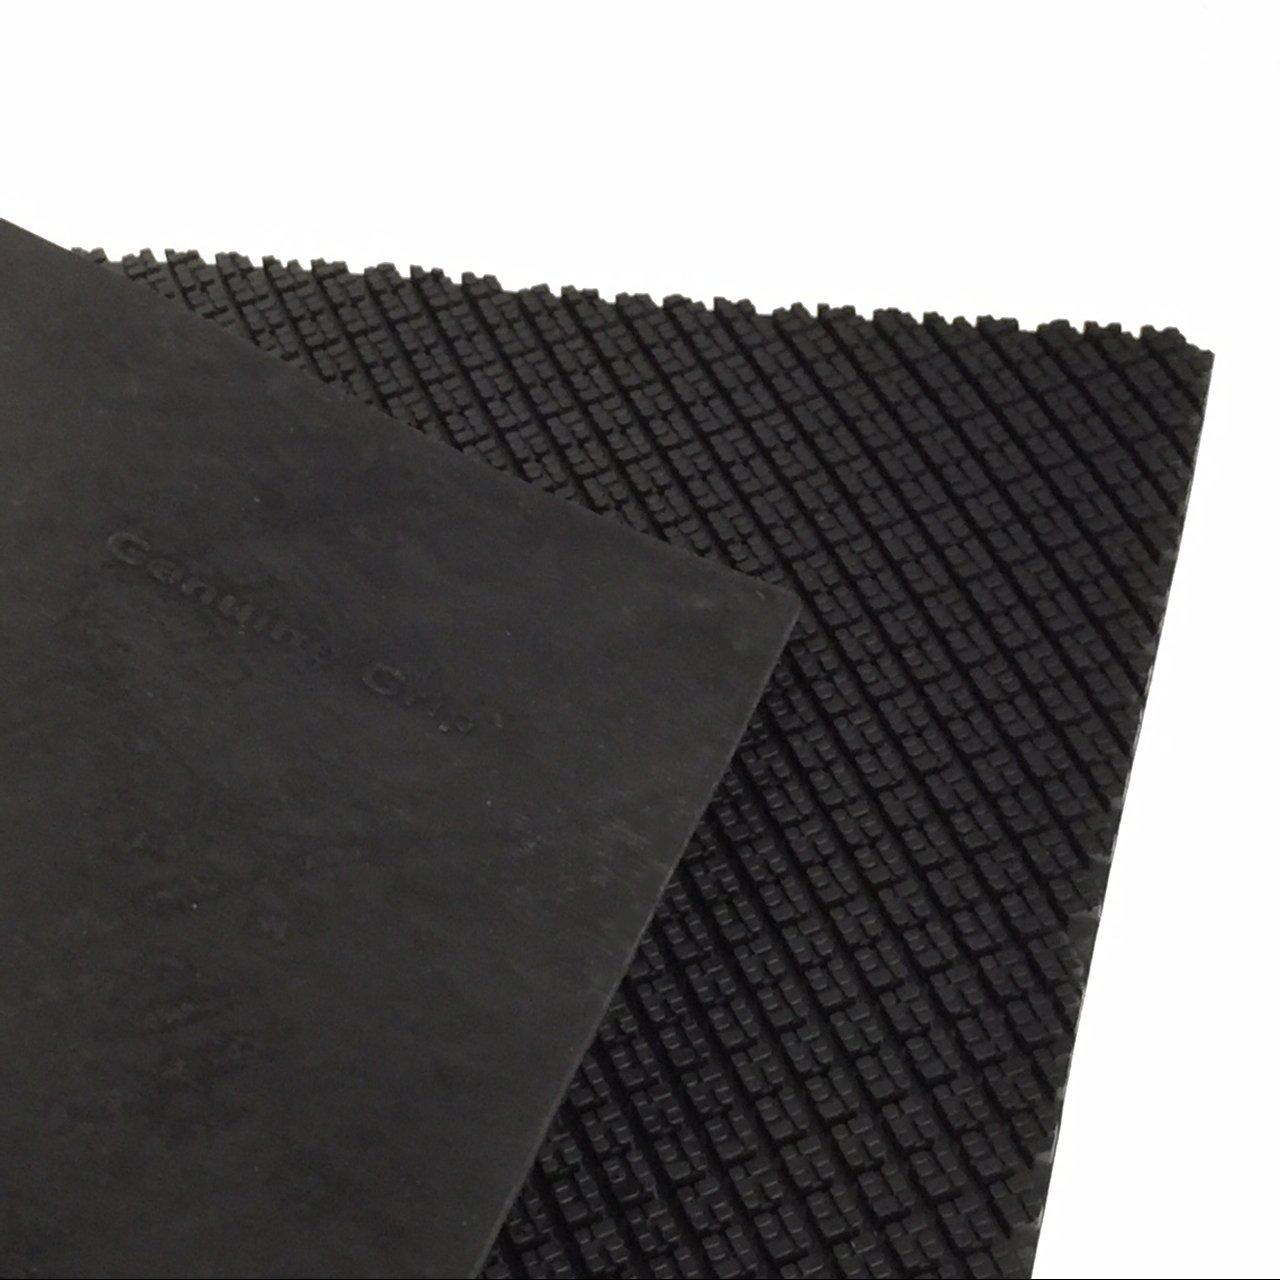 SoleTech Genuine Grip Soling Sheet, 4mm, Black Inc 87G